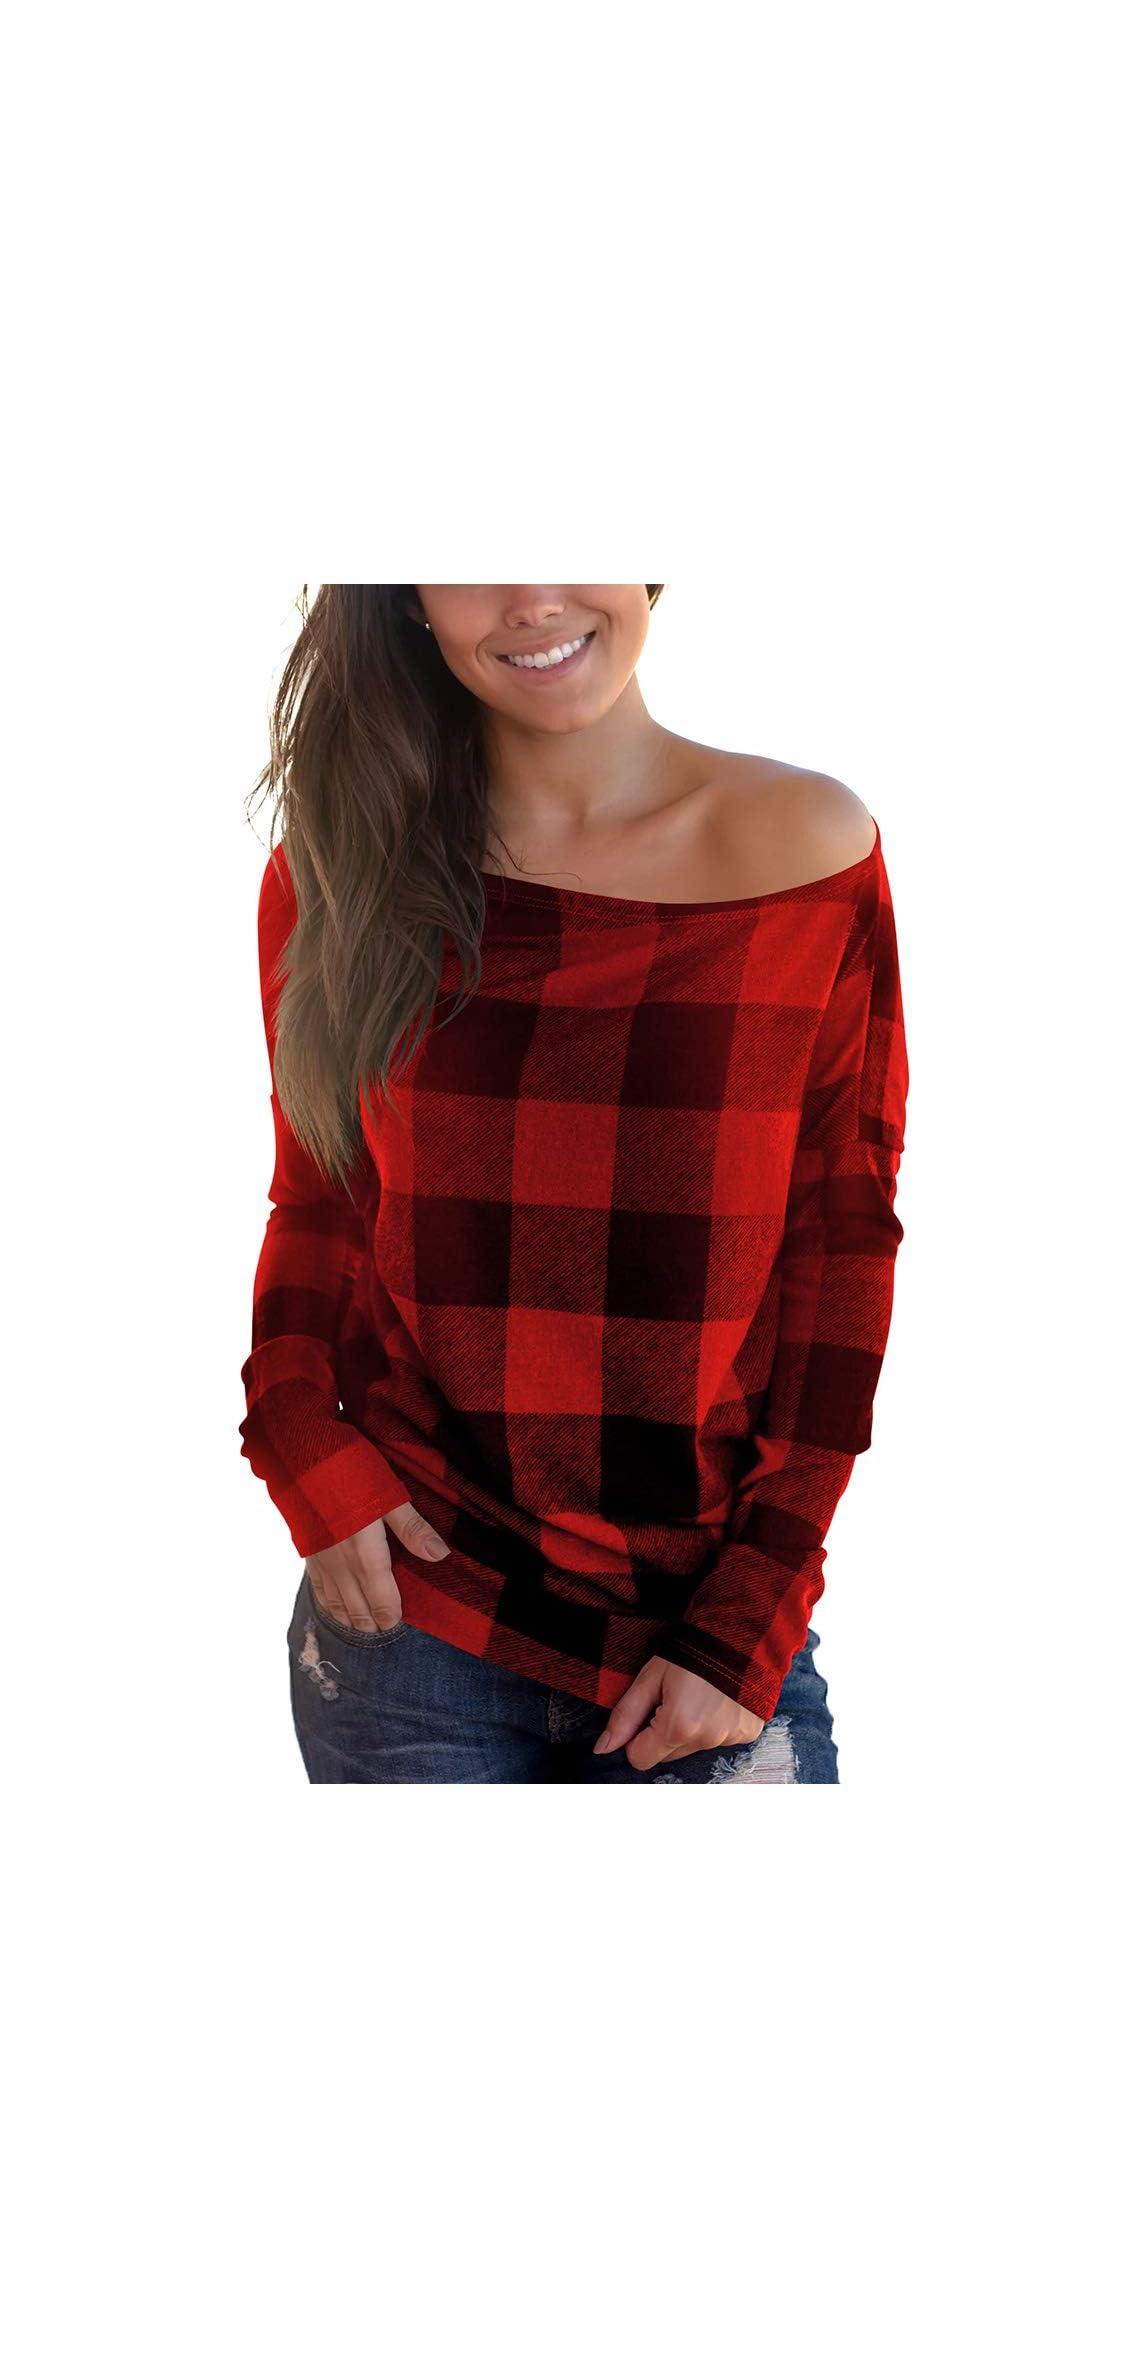 Women's Off Shoulder Top Long Sleeve Plaid Tee Shirt